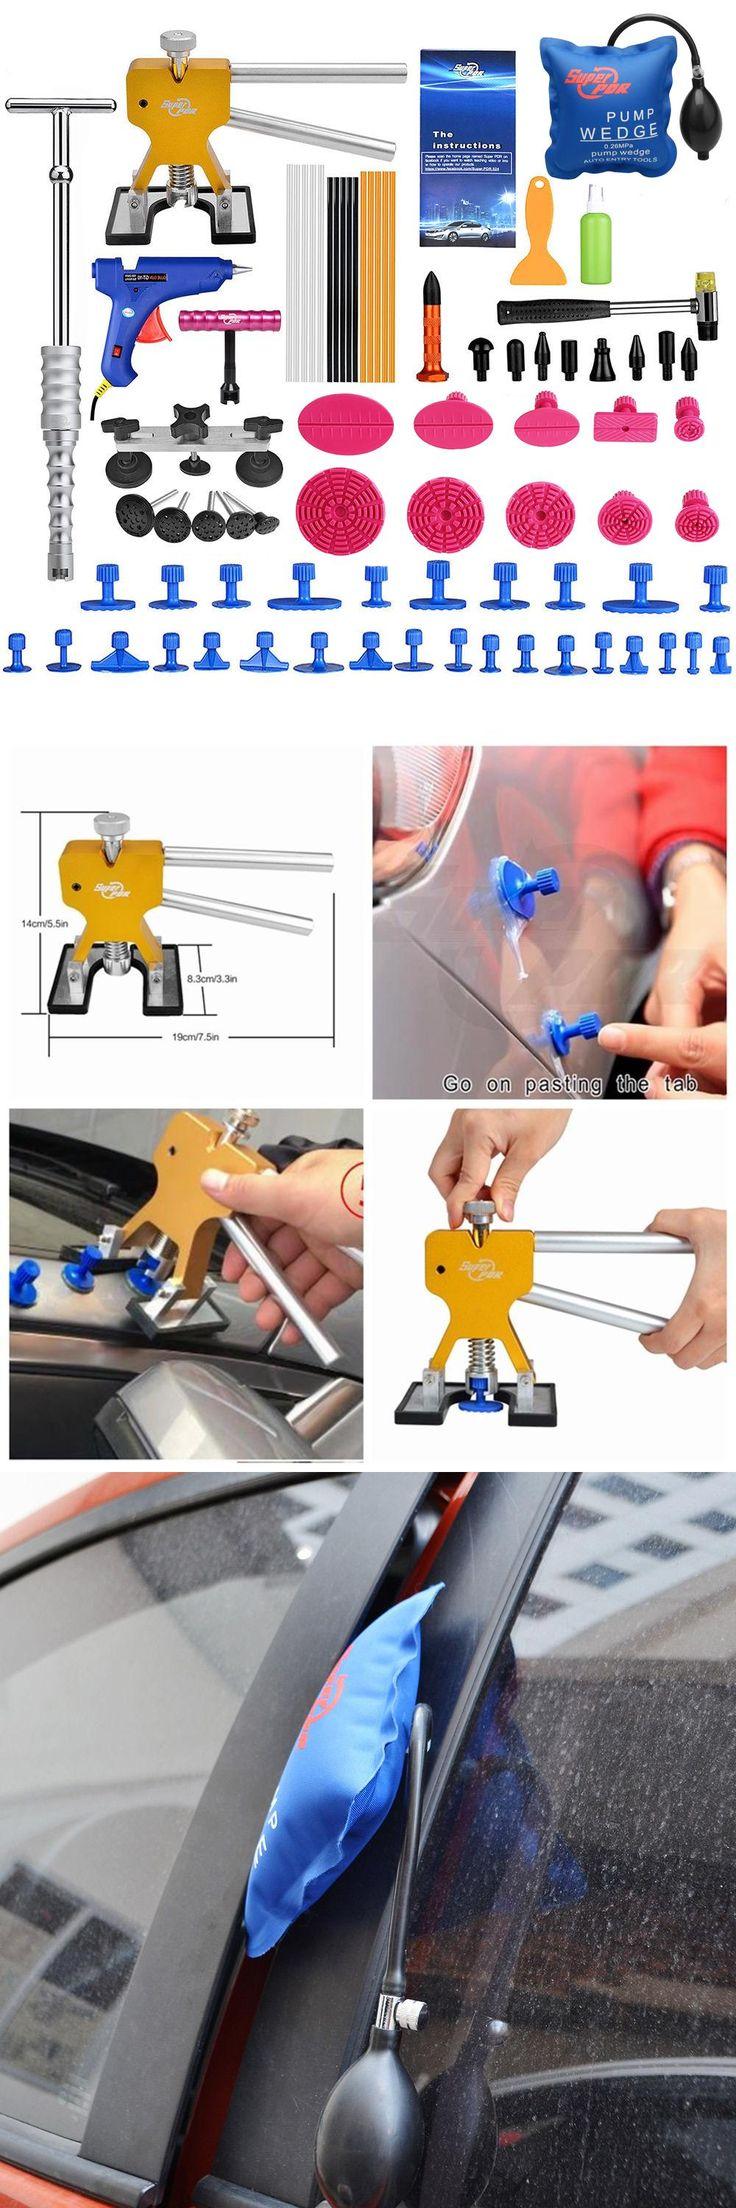 visit to buy pdr tools for car kit instruments car body repair kit dent